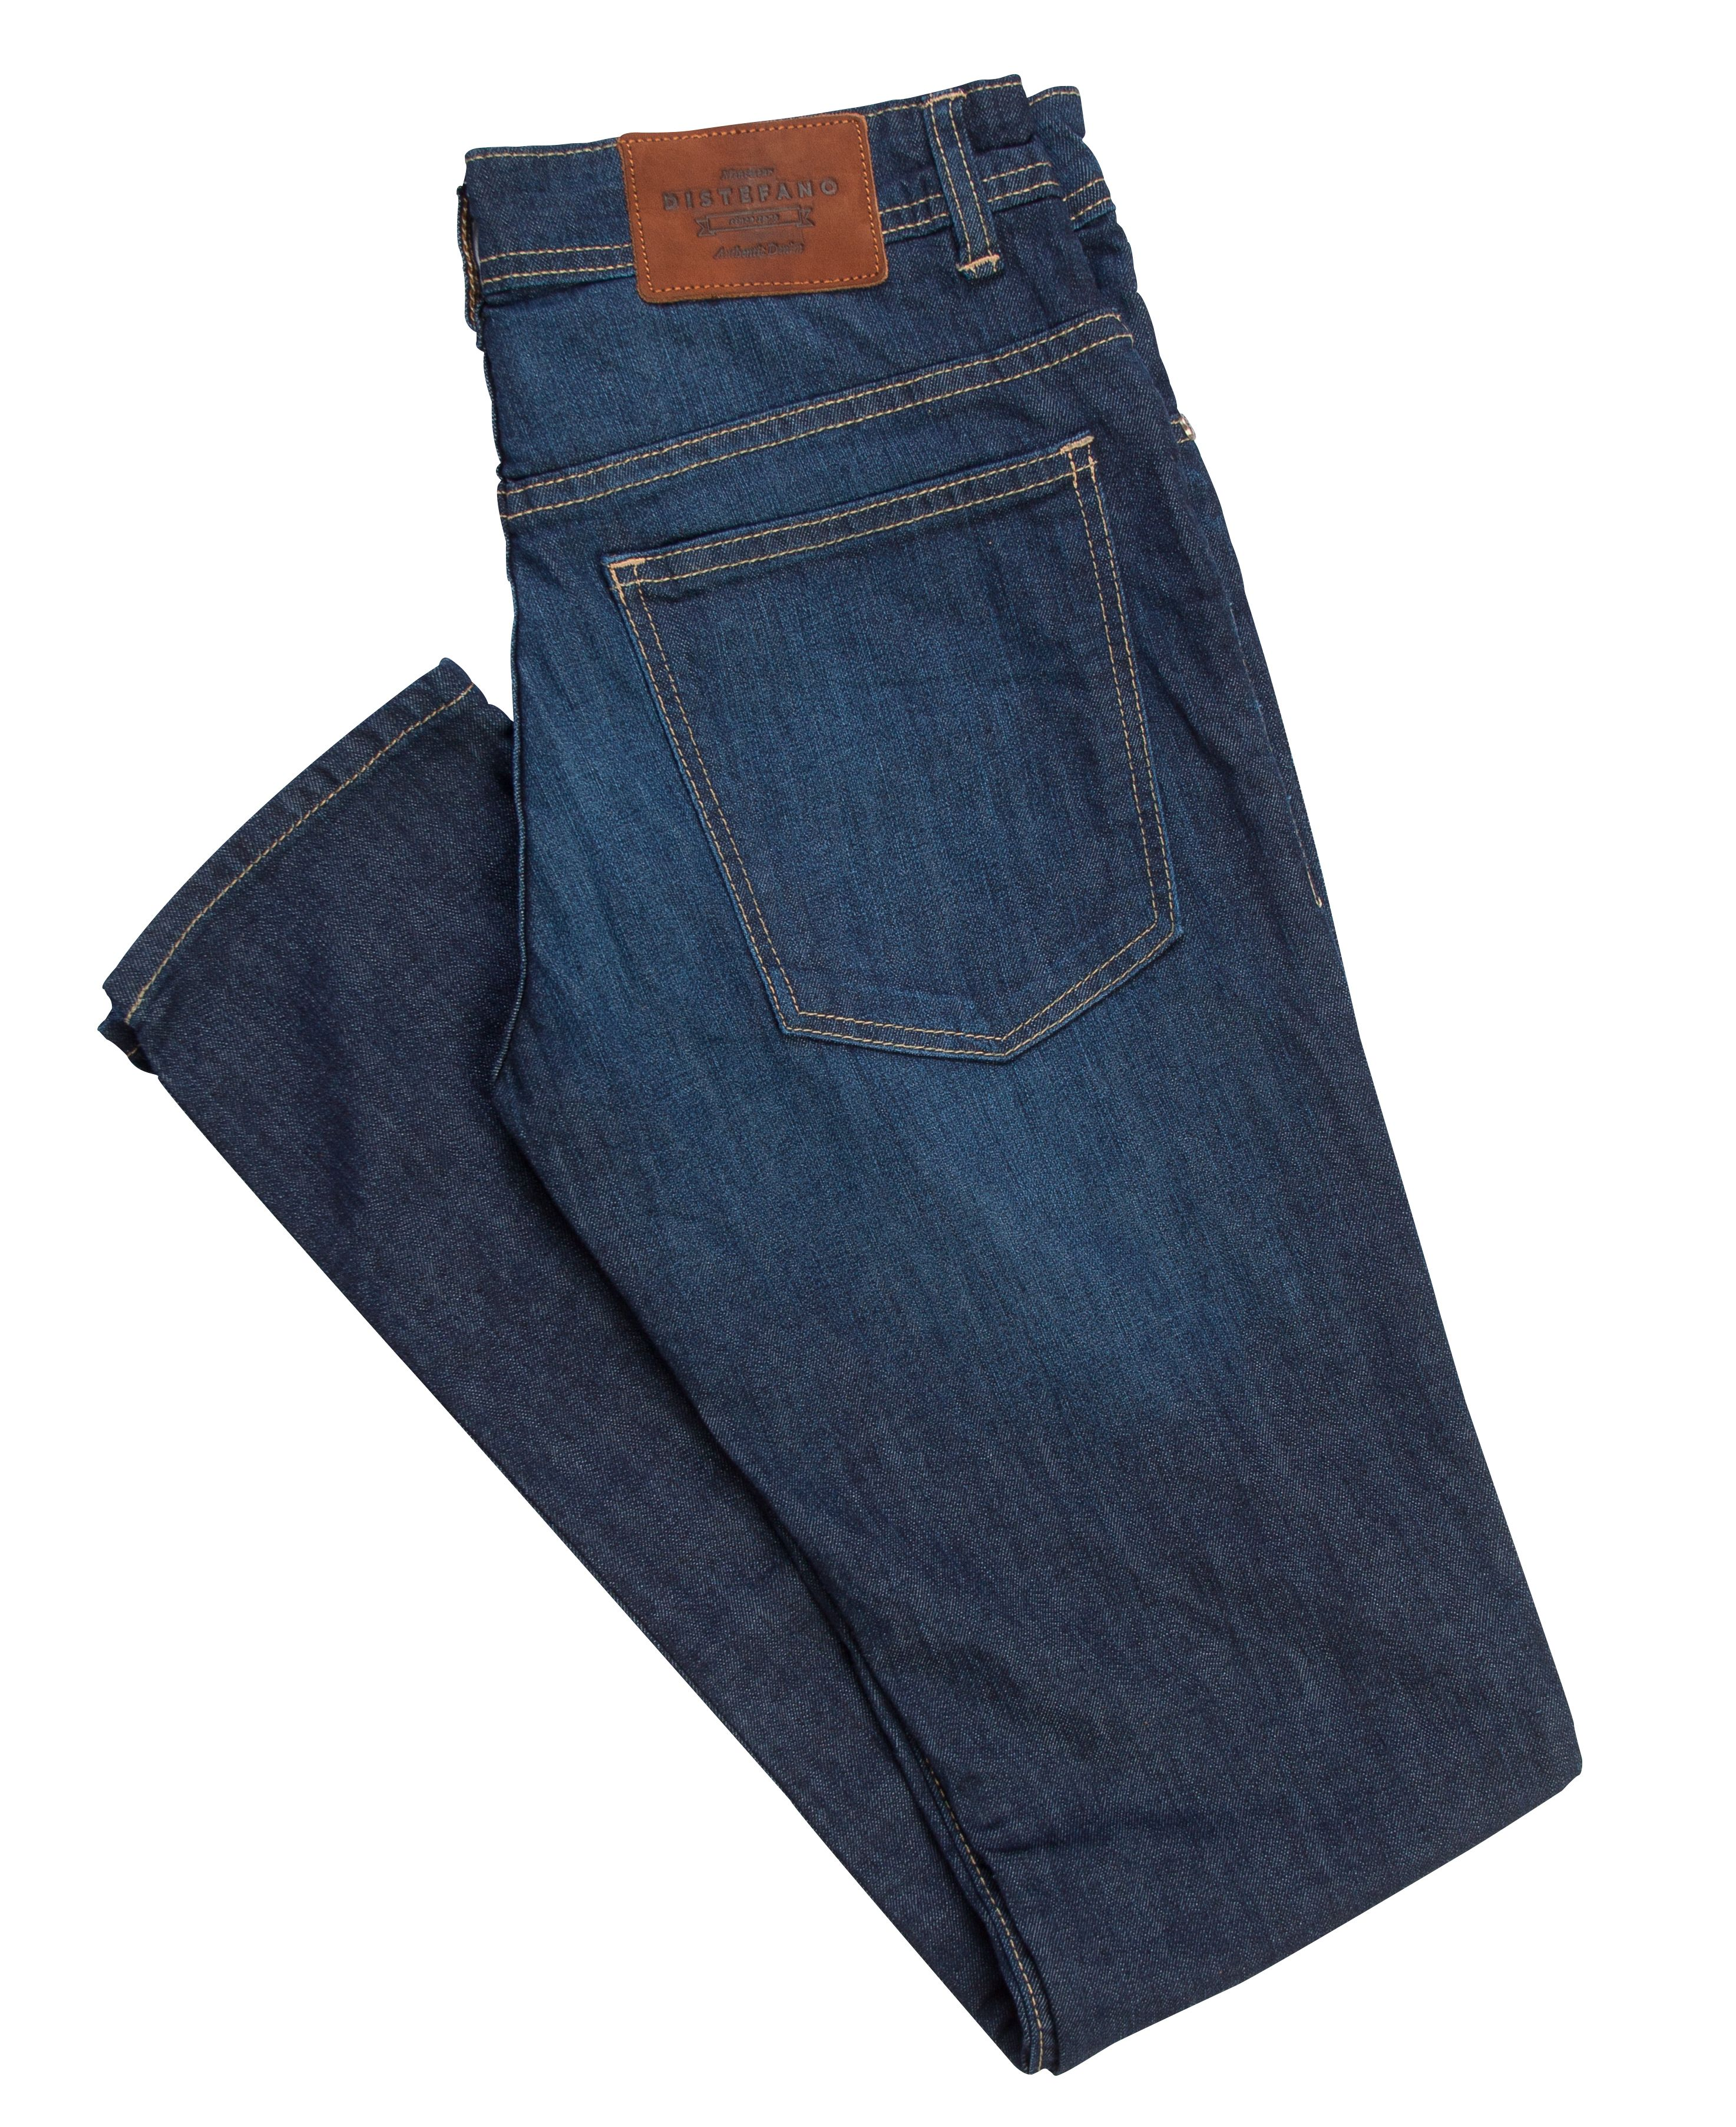 Jeans corte recto • Distefano